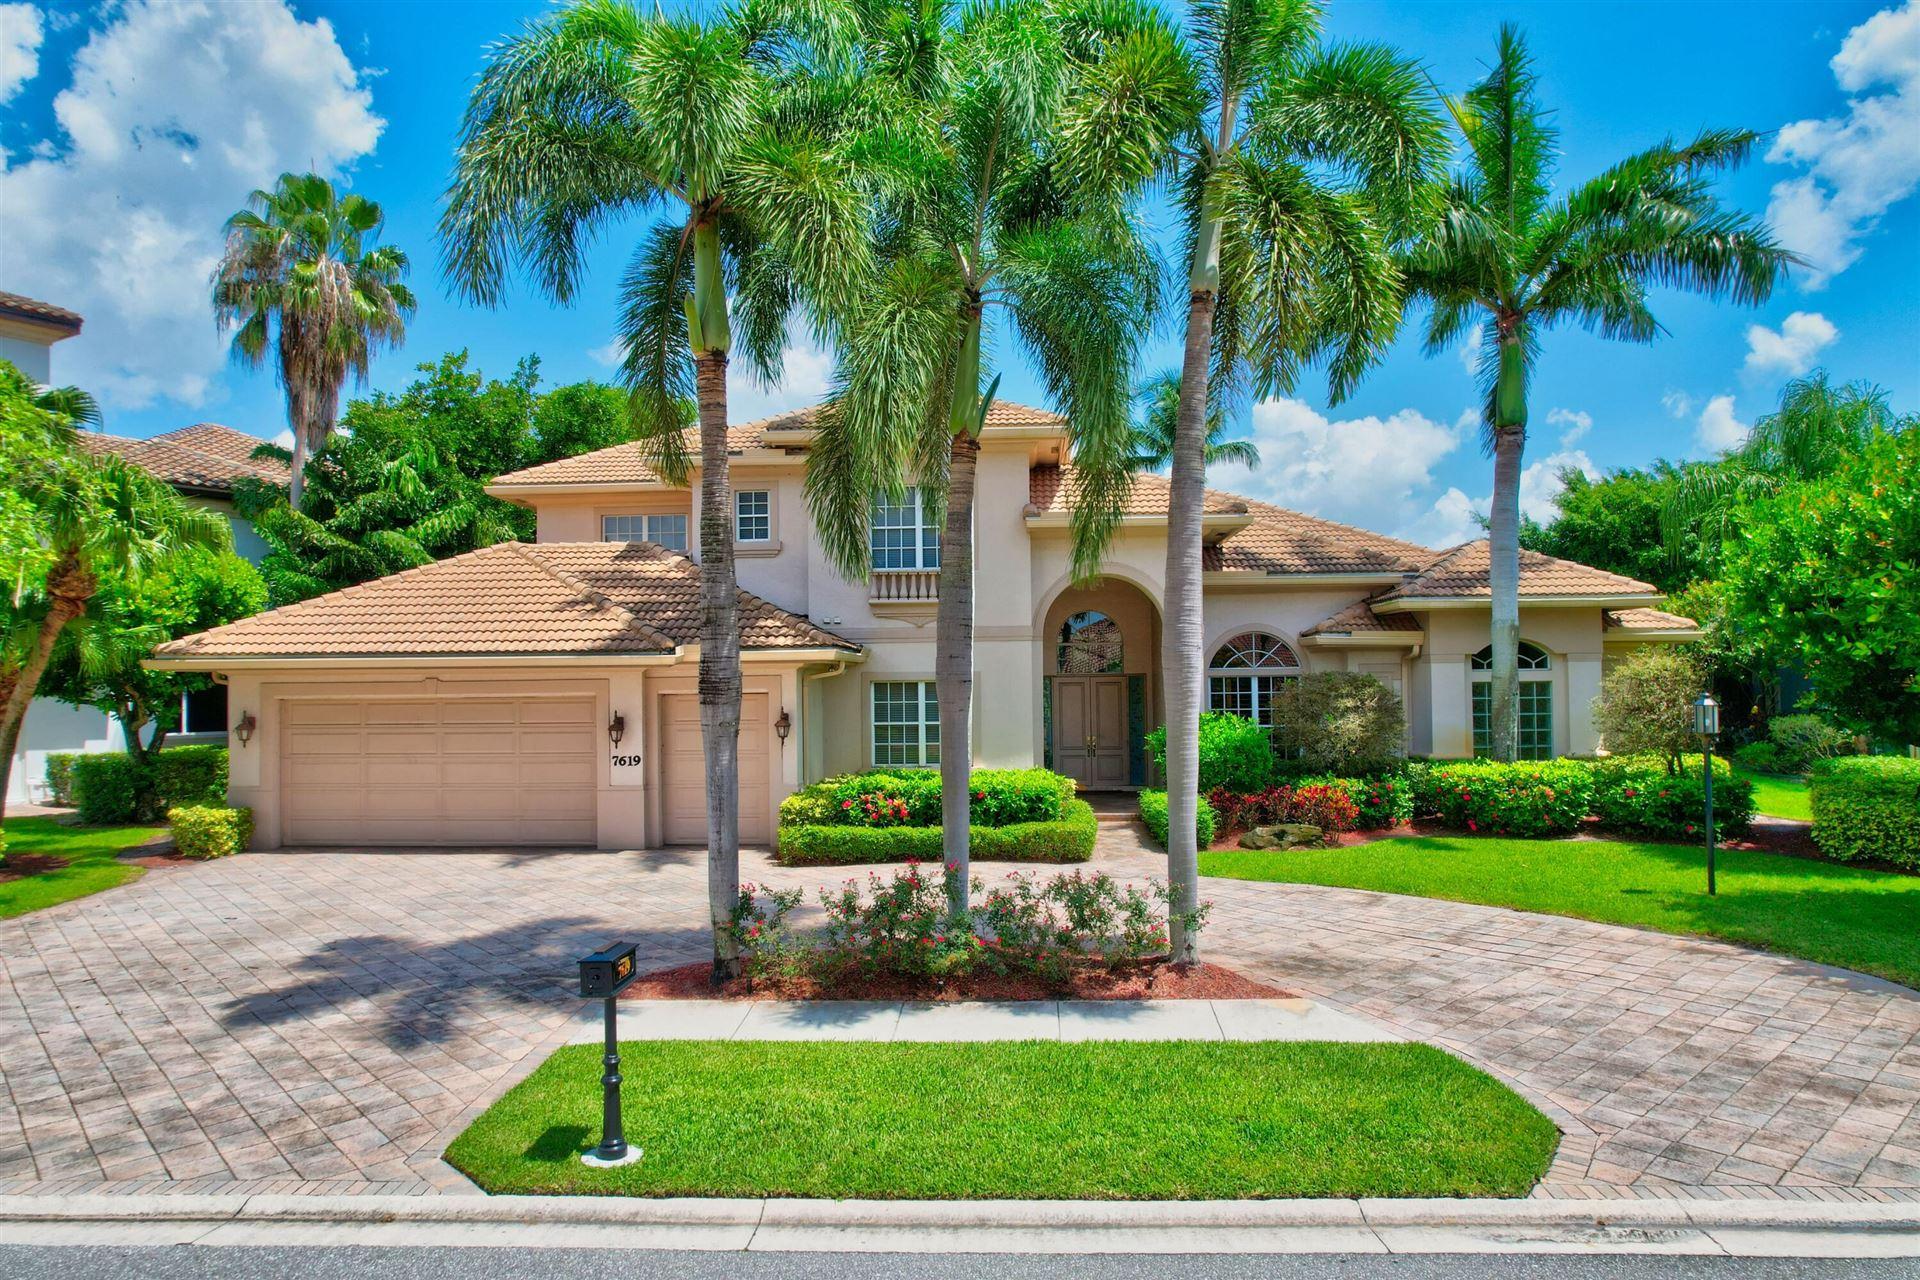 7619 Mandarin Drive, Boca Raton, FL 33433 - #: RX-10735324